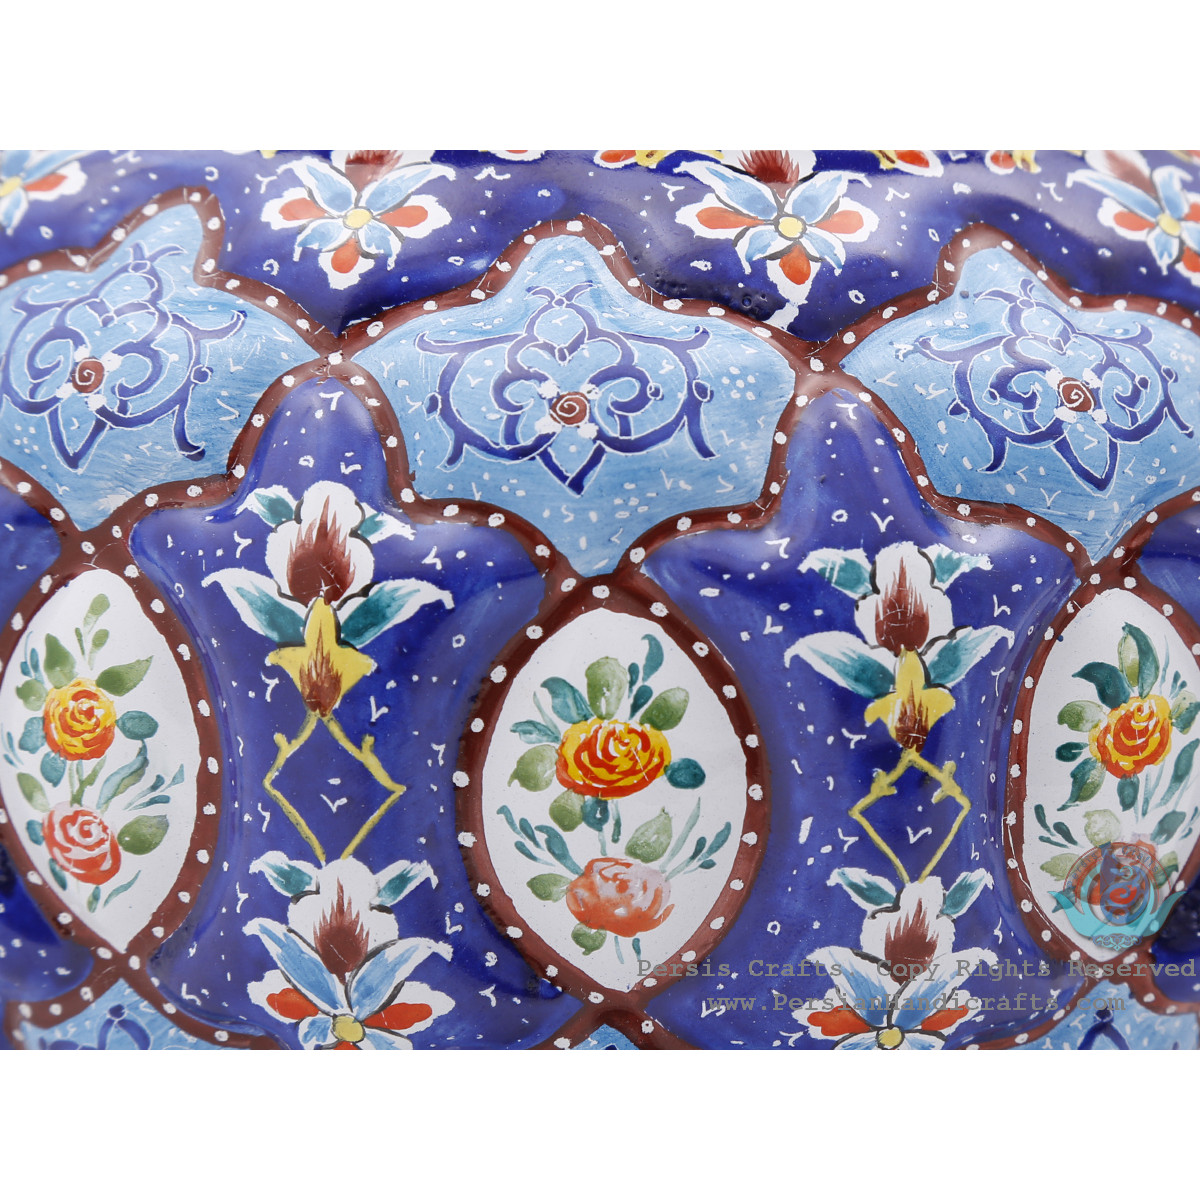 Privileged Candy Dish w Eslimi & Toranj Minakari Design - HE4003-Persian Handicrafts